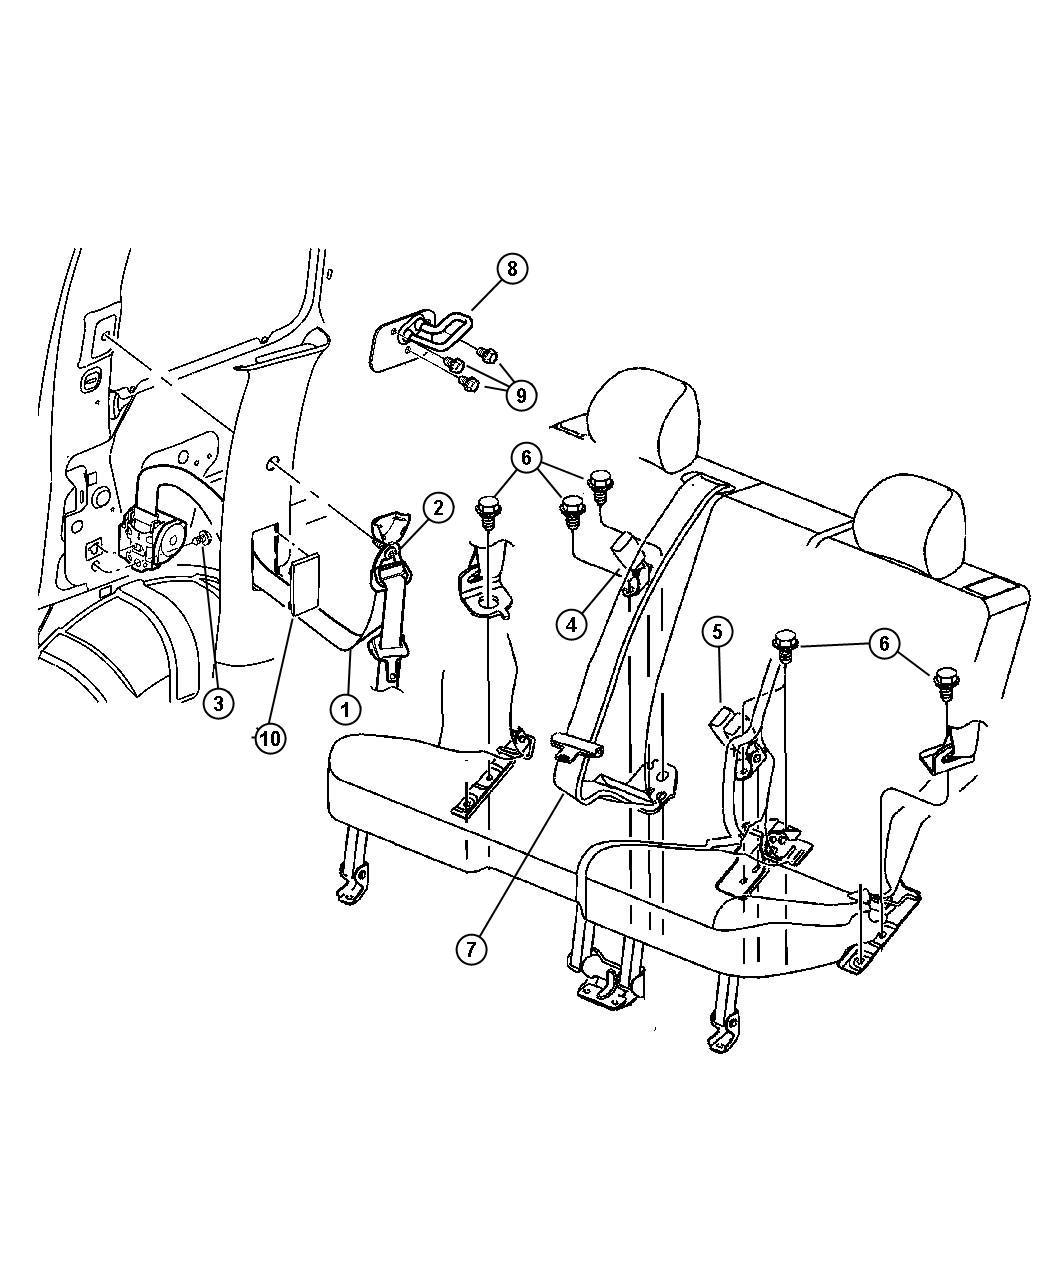 Jeep Liberty Seat Belt Rr Cntr Shoulder Dv Dv